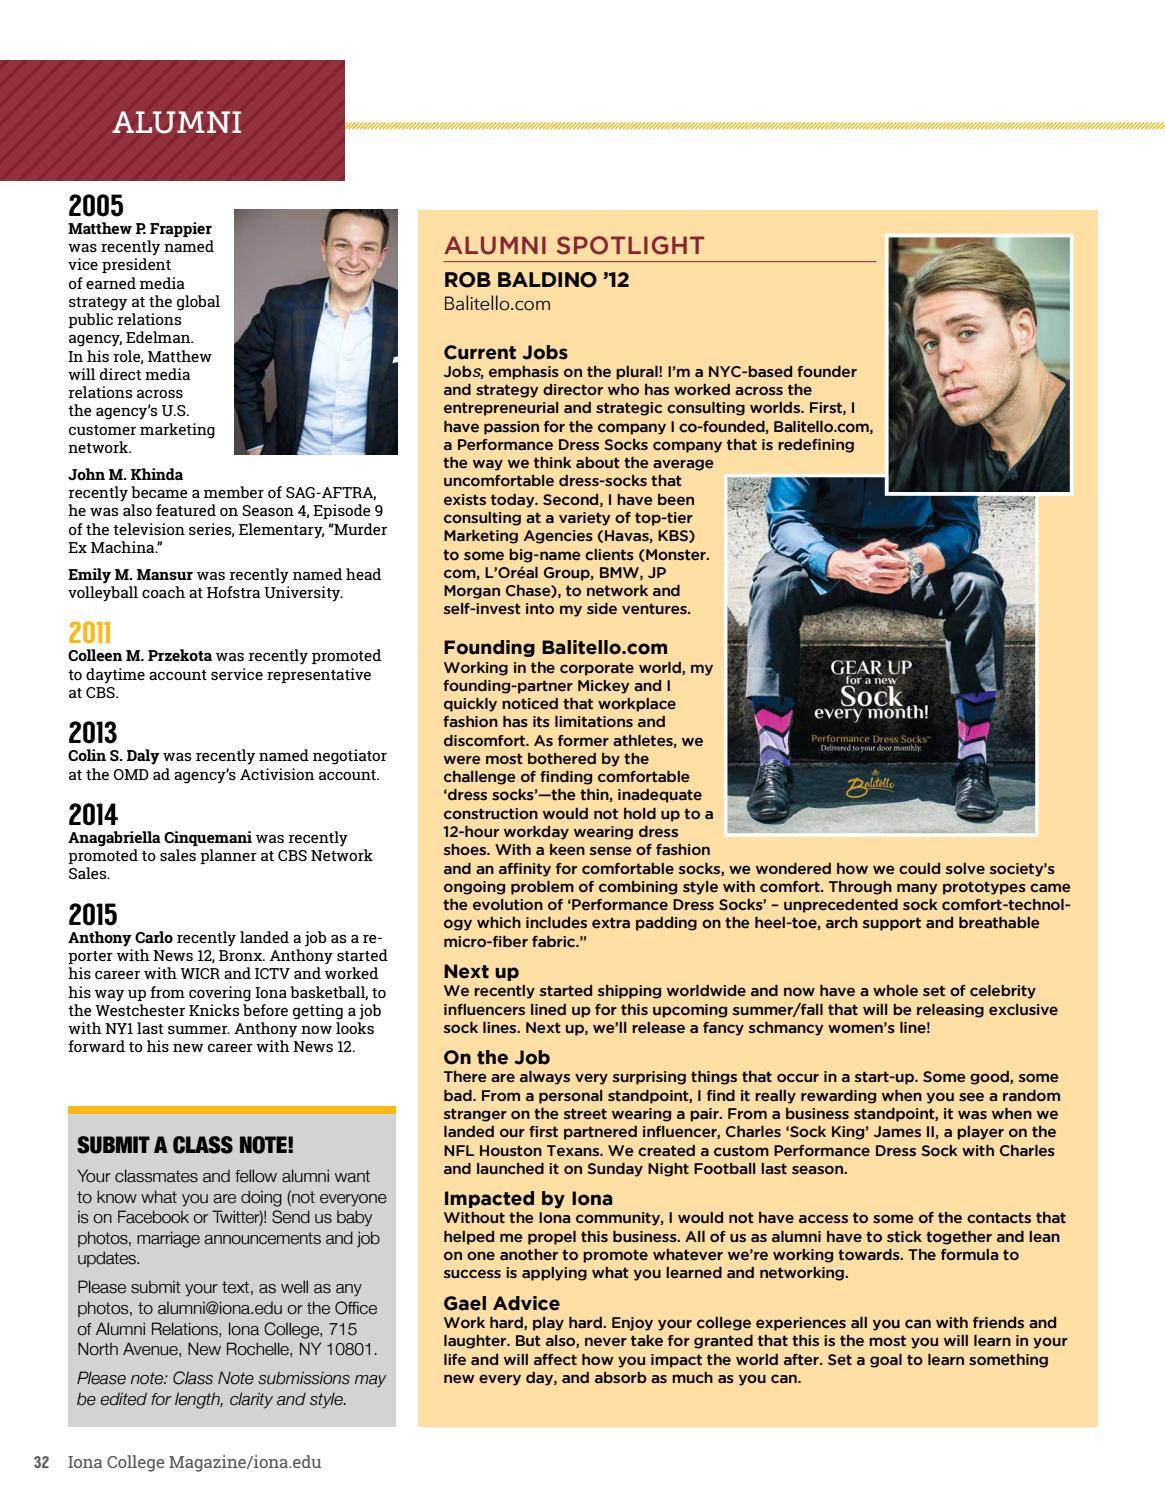 Iona College Magazine Summer 2016 by Iona College - issuu